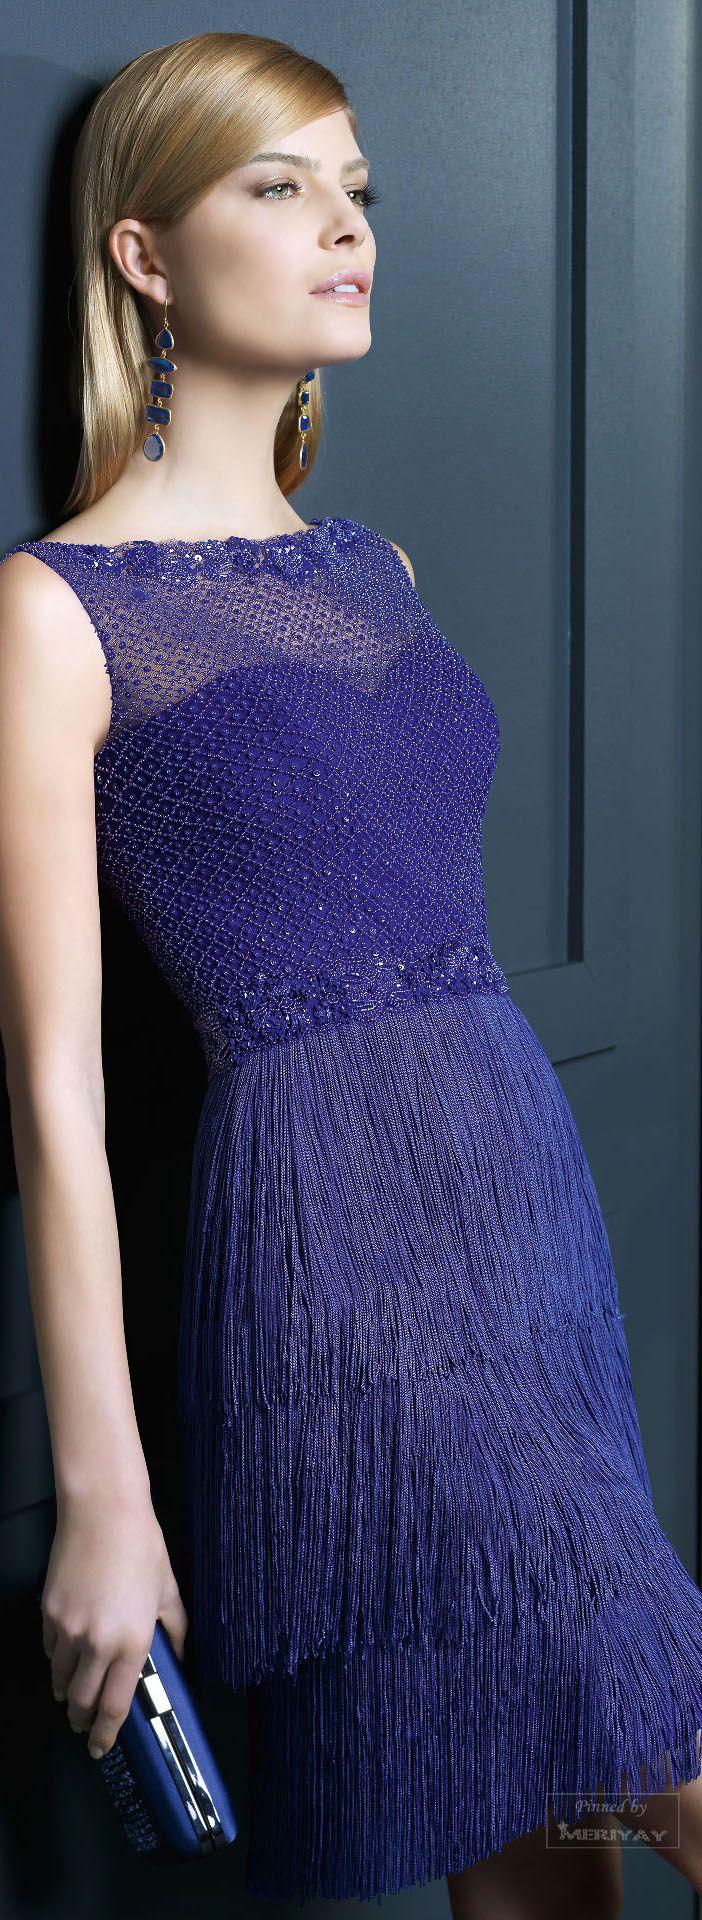 35 best vestidos con flecos images on Pinterest   Fringes, Party ...